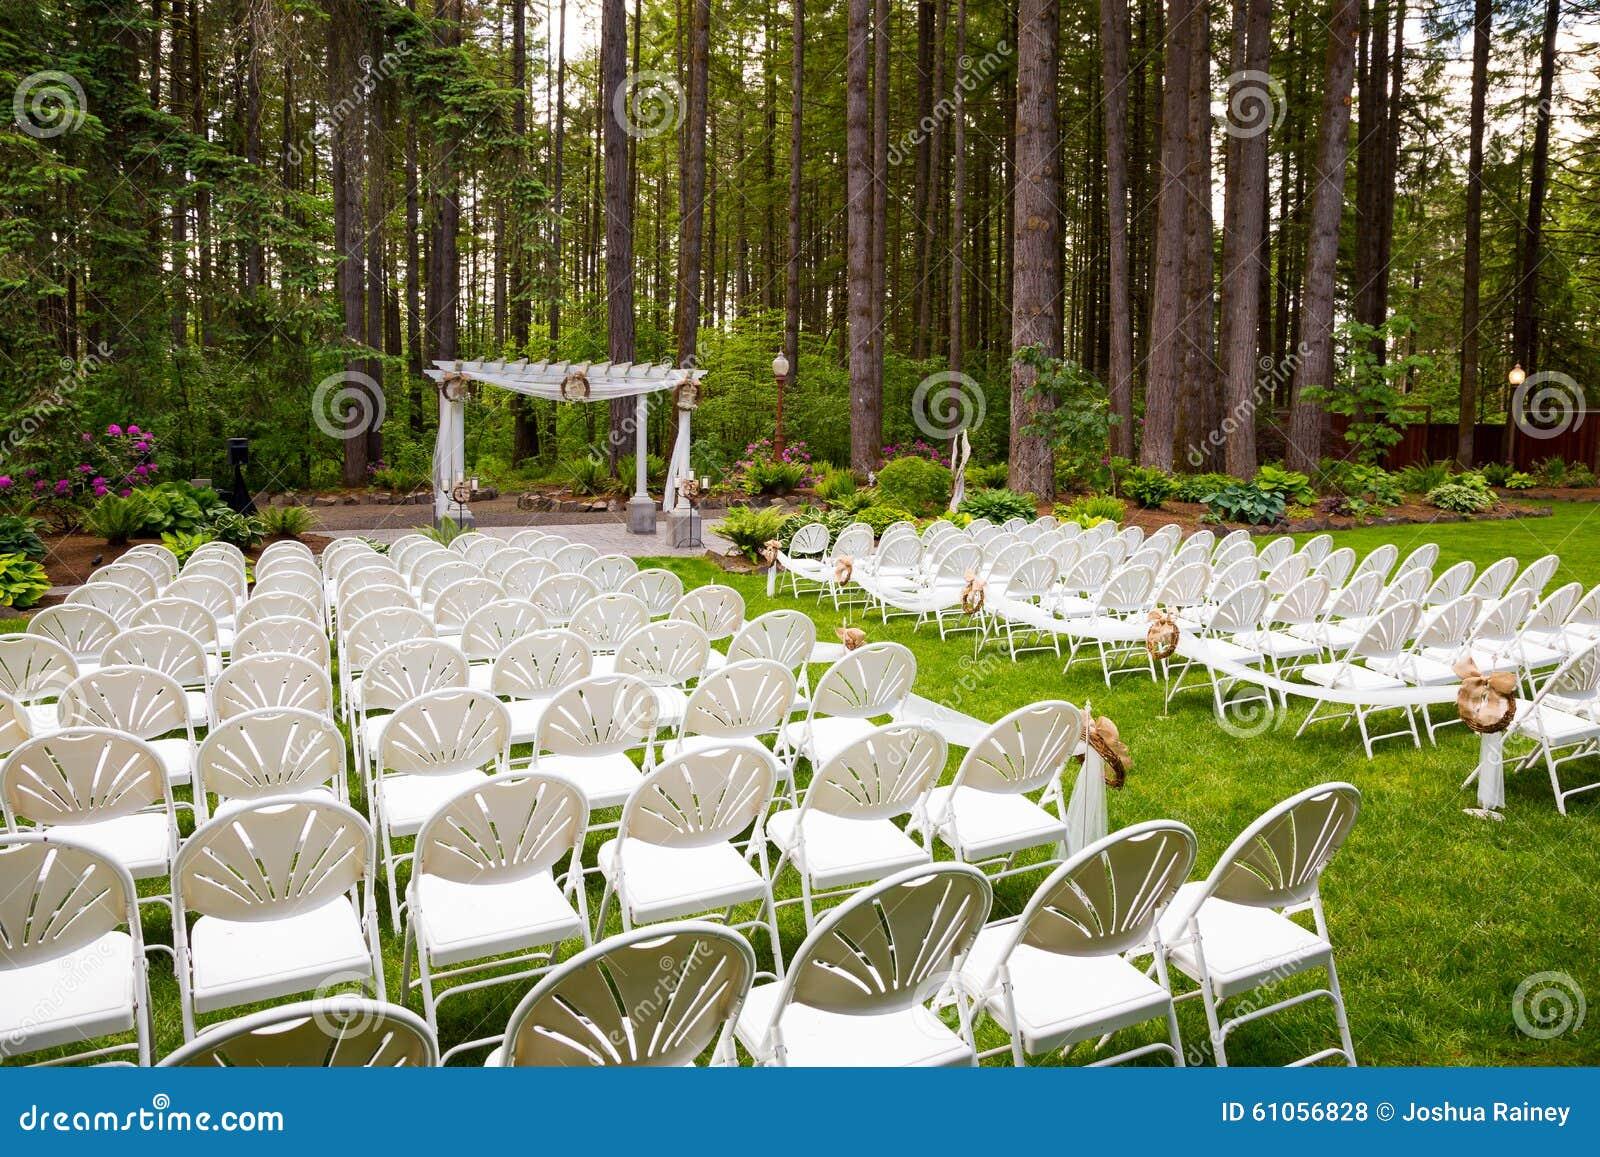 Outdoor Natural Wedding Venue In Oregon Stock Photo ...